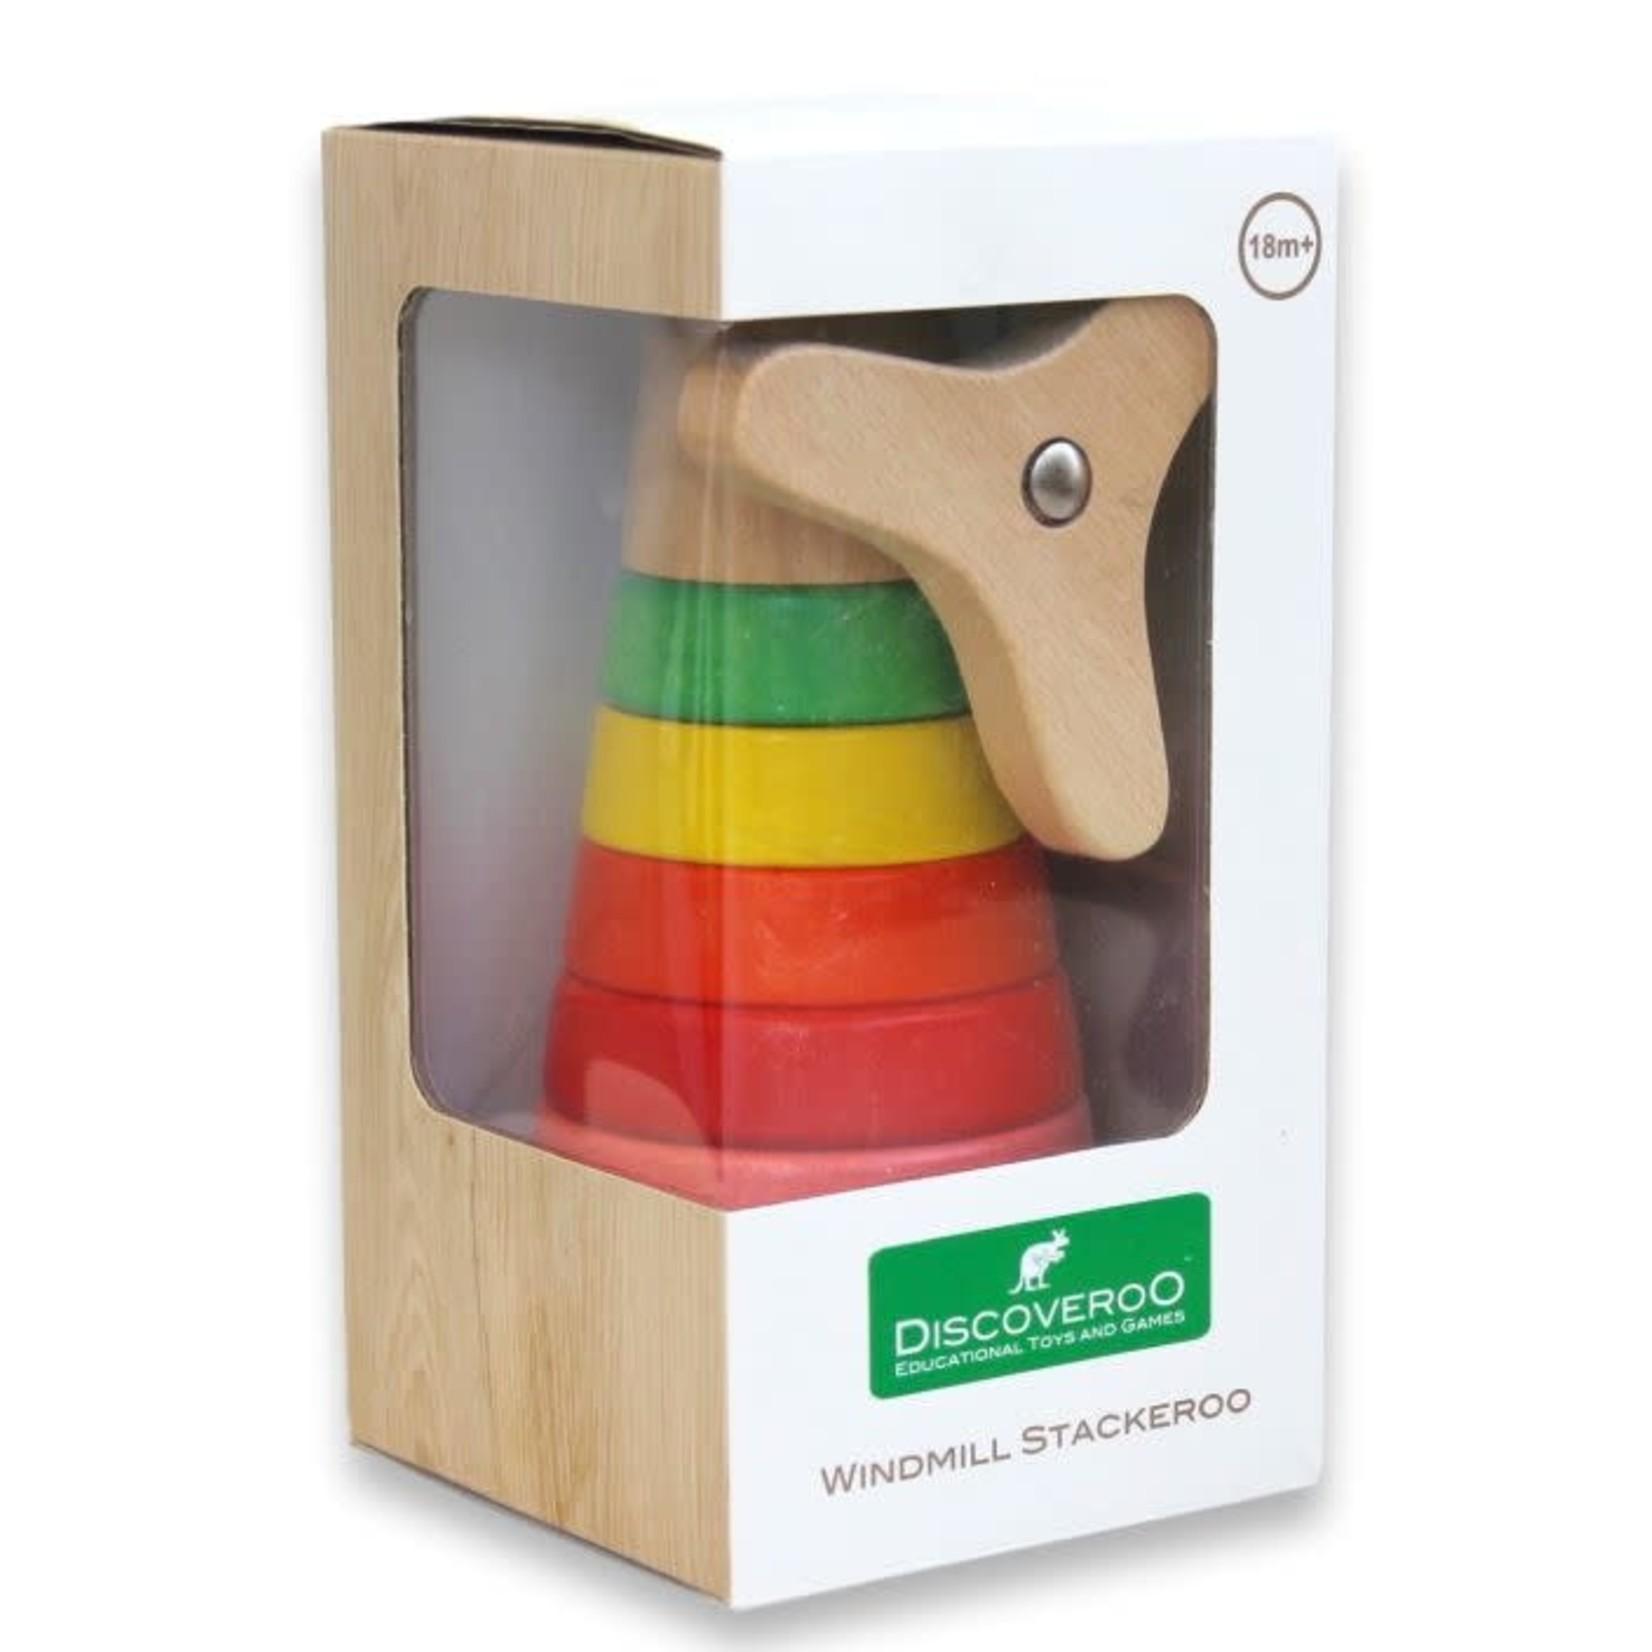 Baby Brands Discoveroo: Windmill Stackeroo